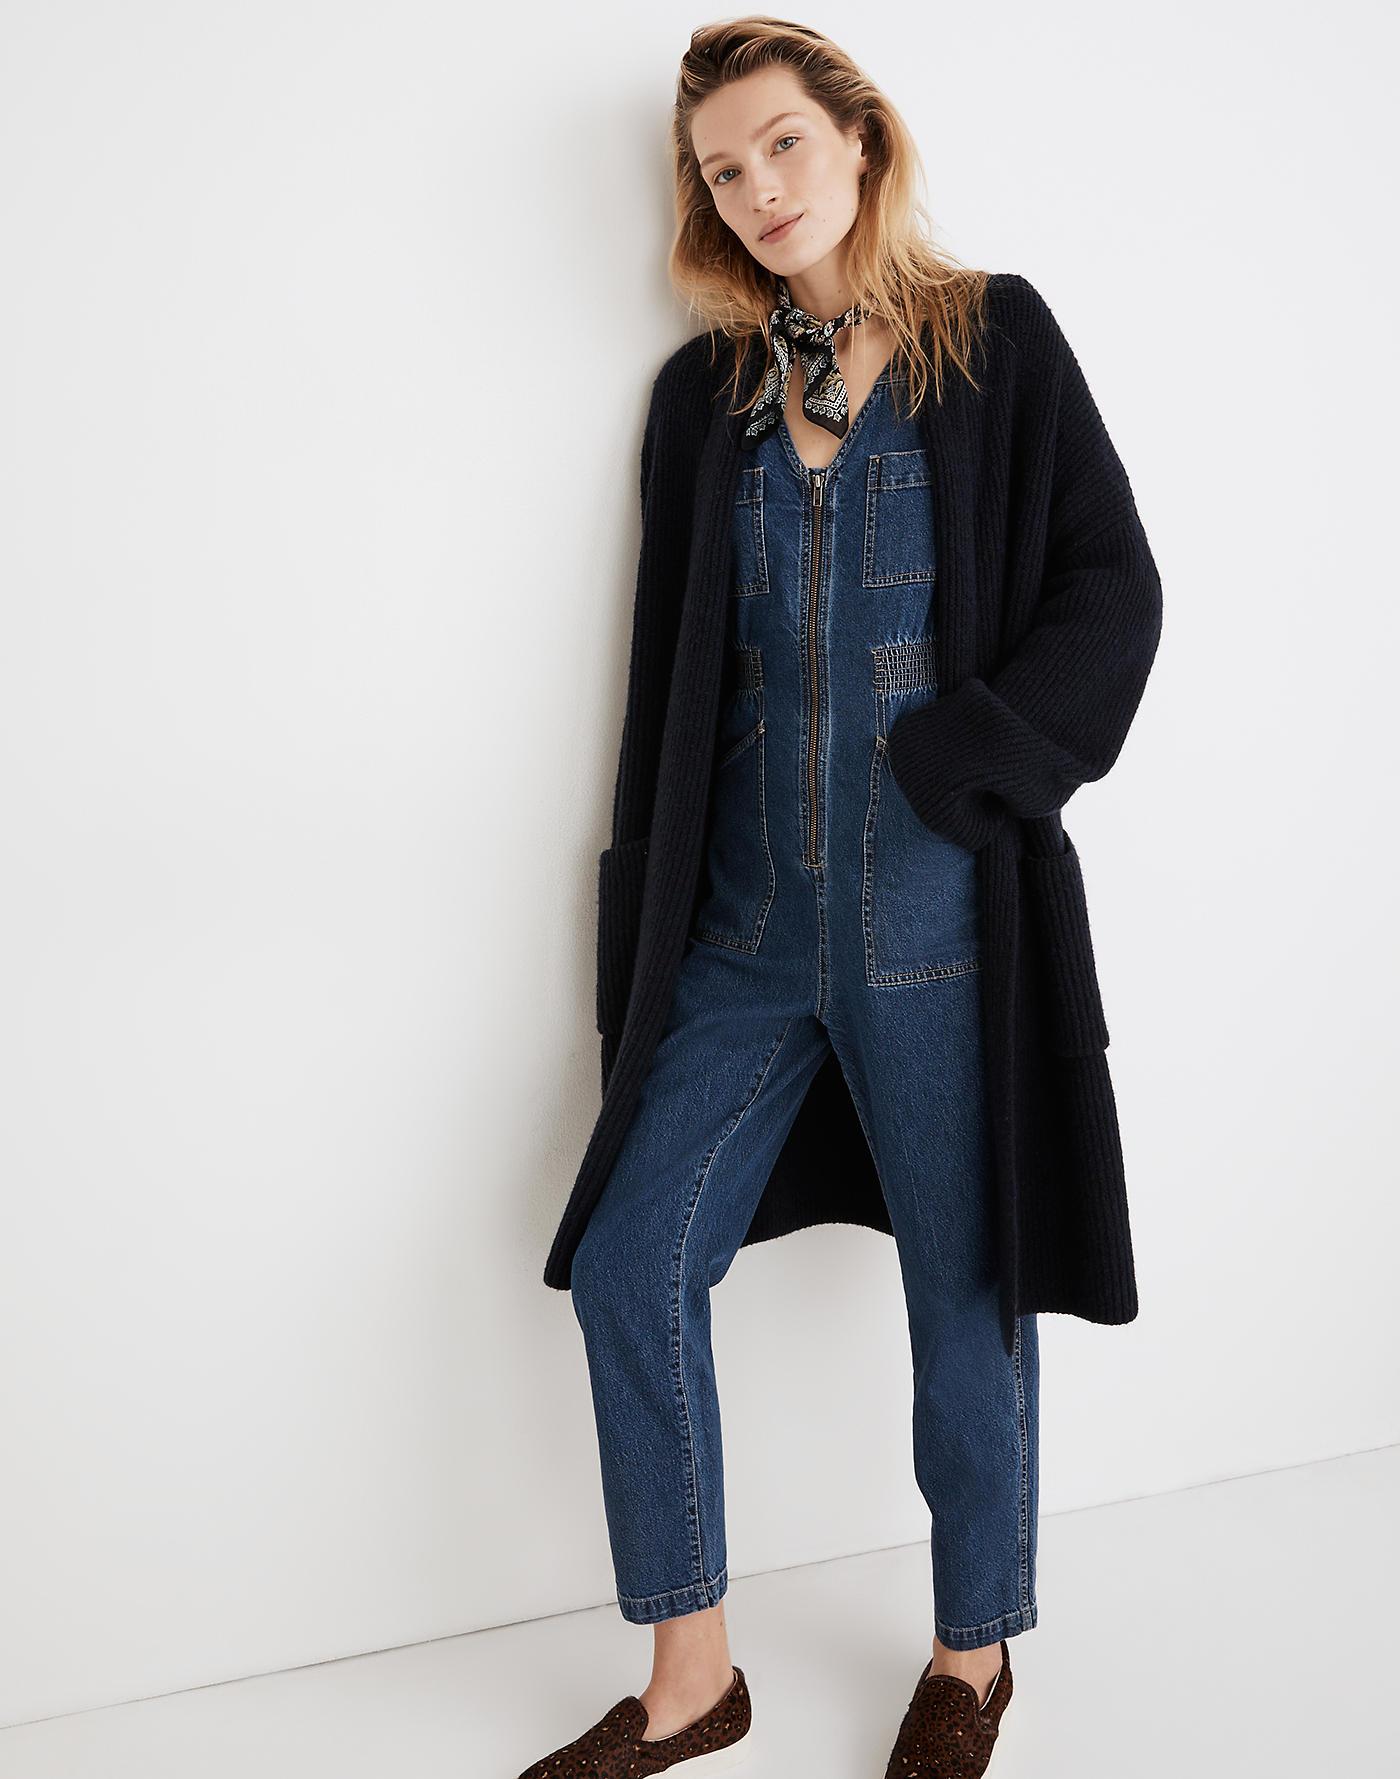 Madewell Marion Sweater-Coat in Coziest Yarn